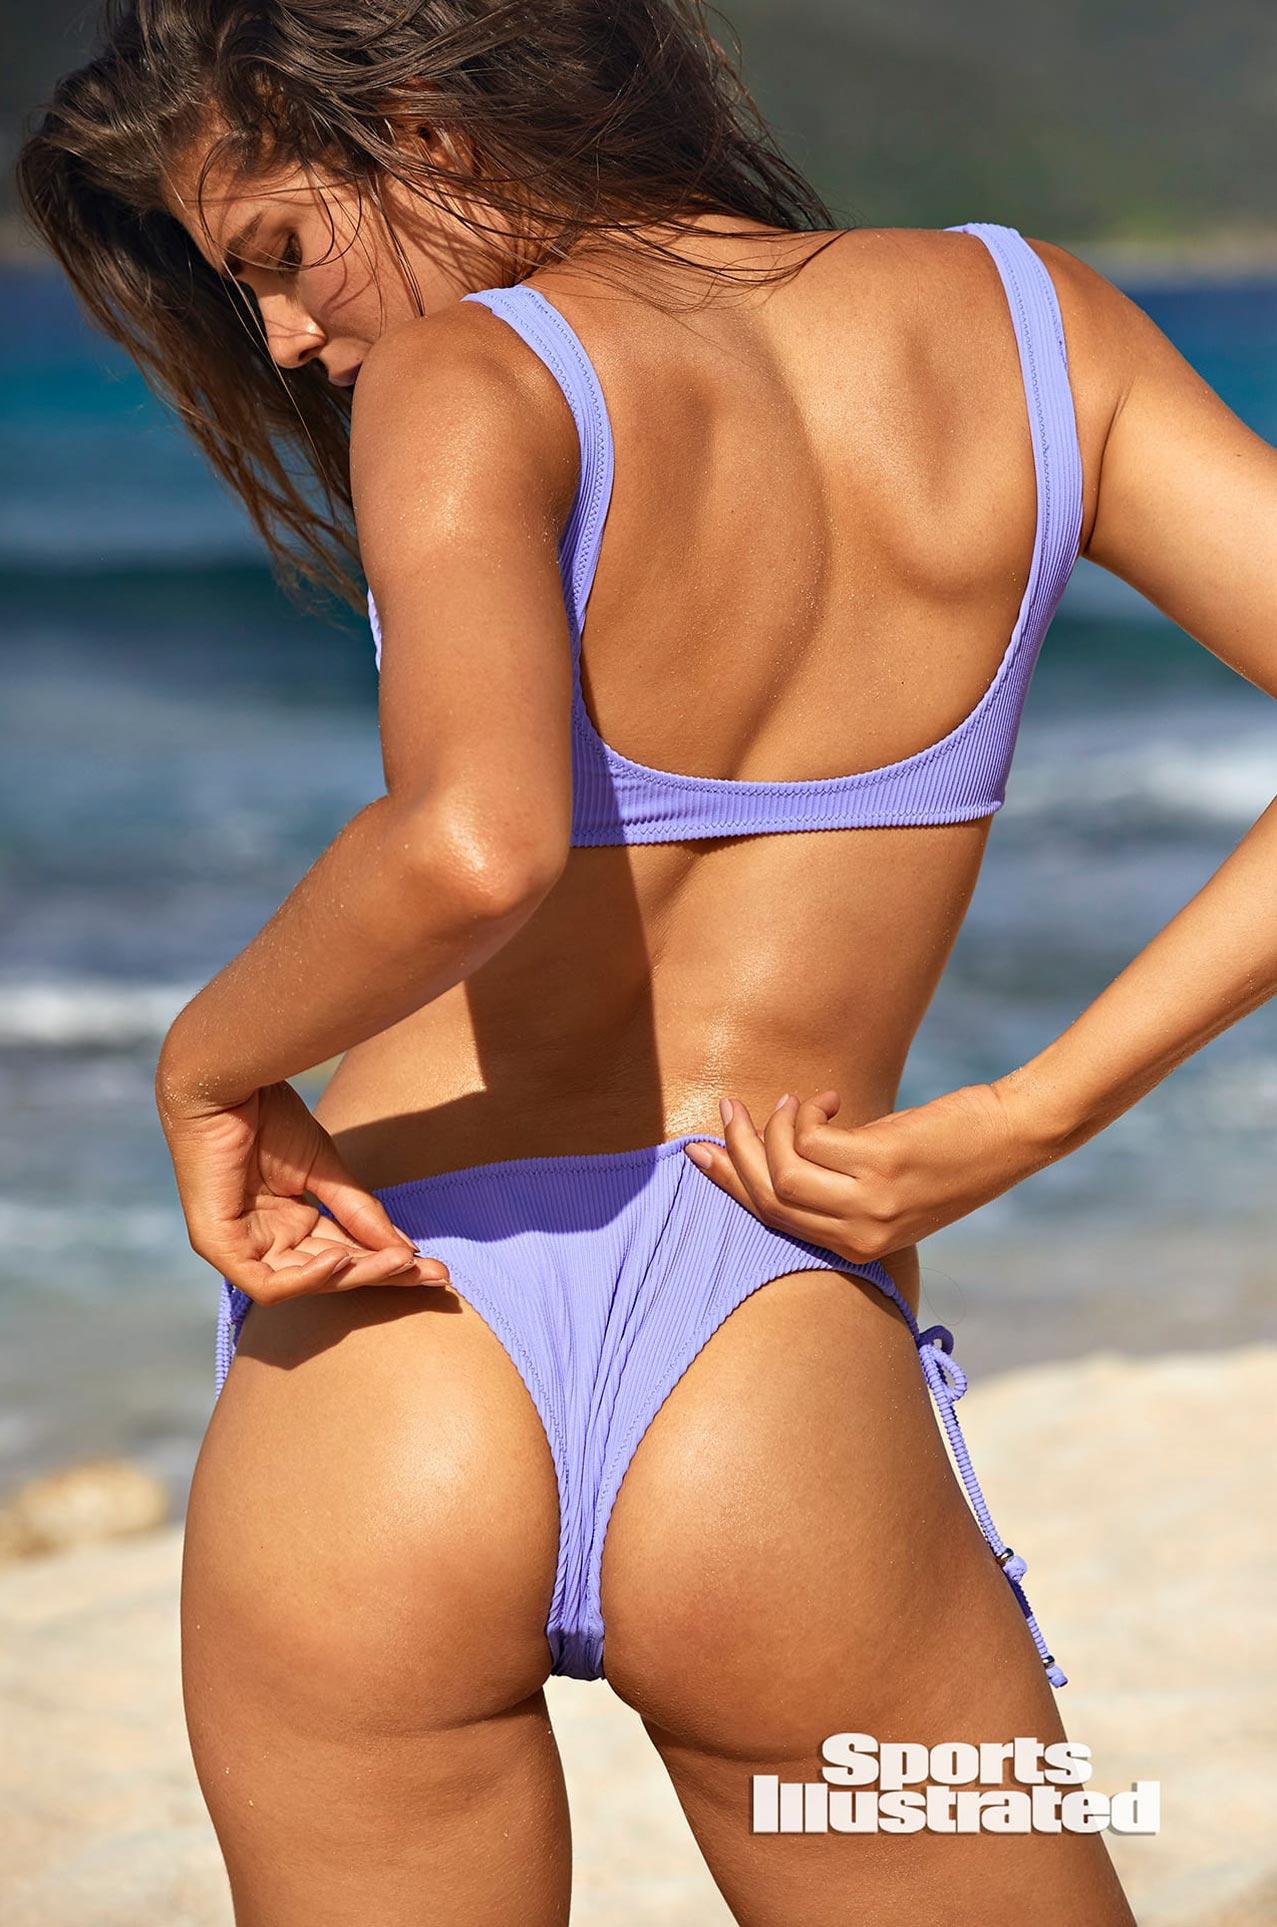 Валентина Сампайо в каталоге купальников Sports Illustrated Swimsuit 2020 / фото 10